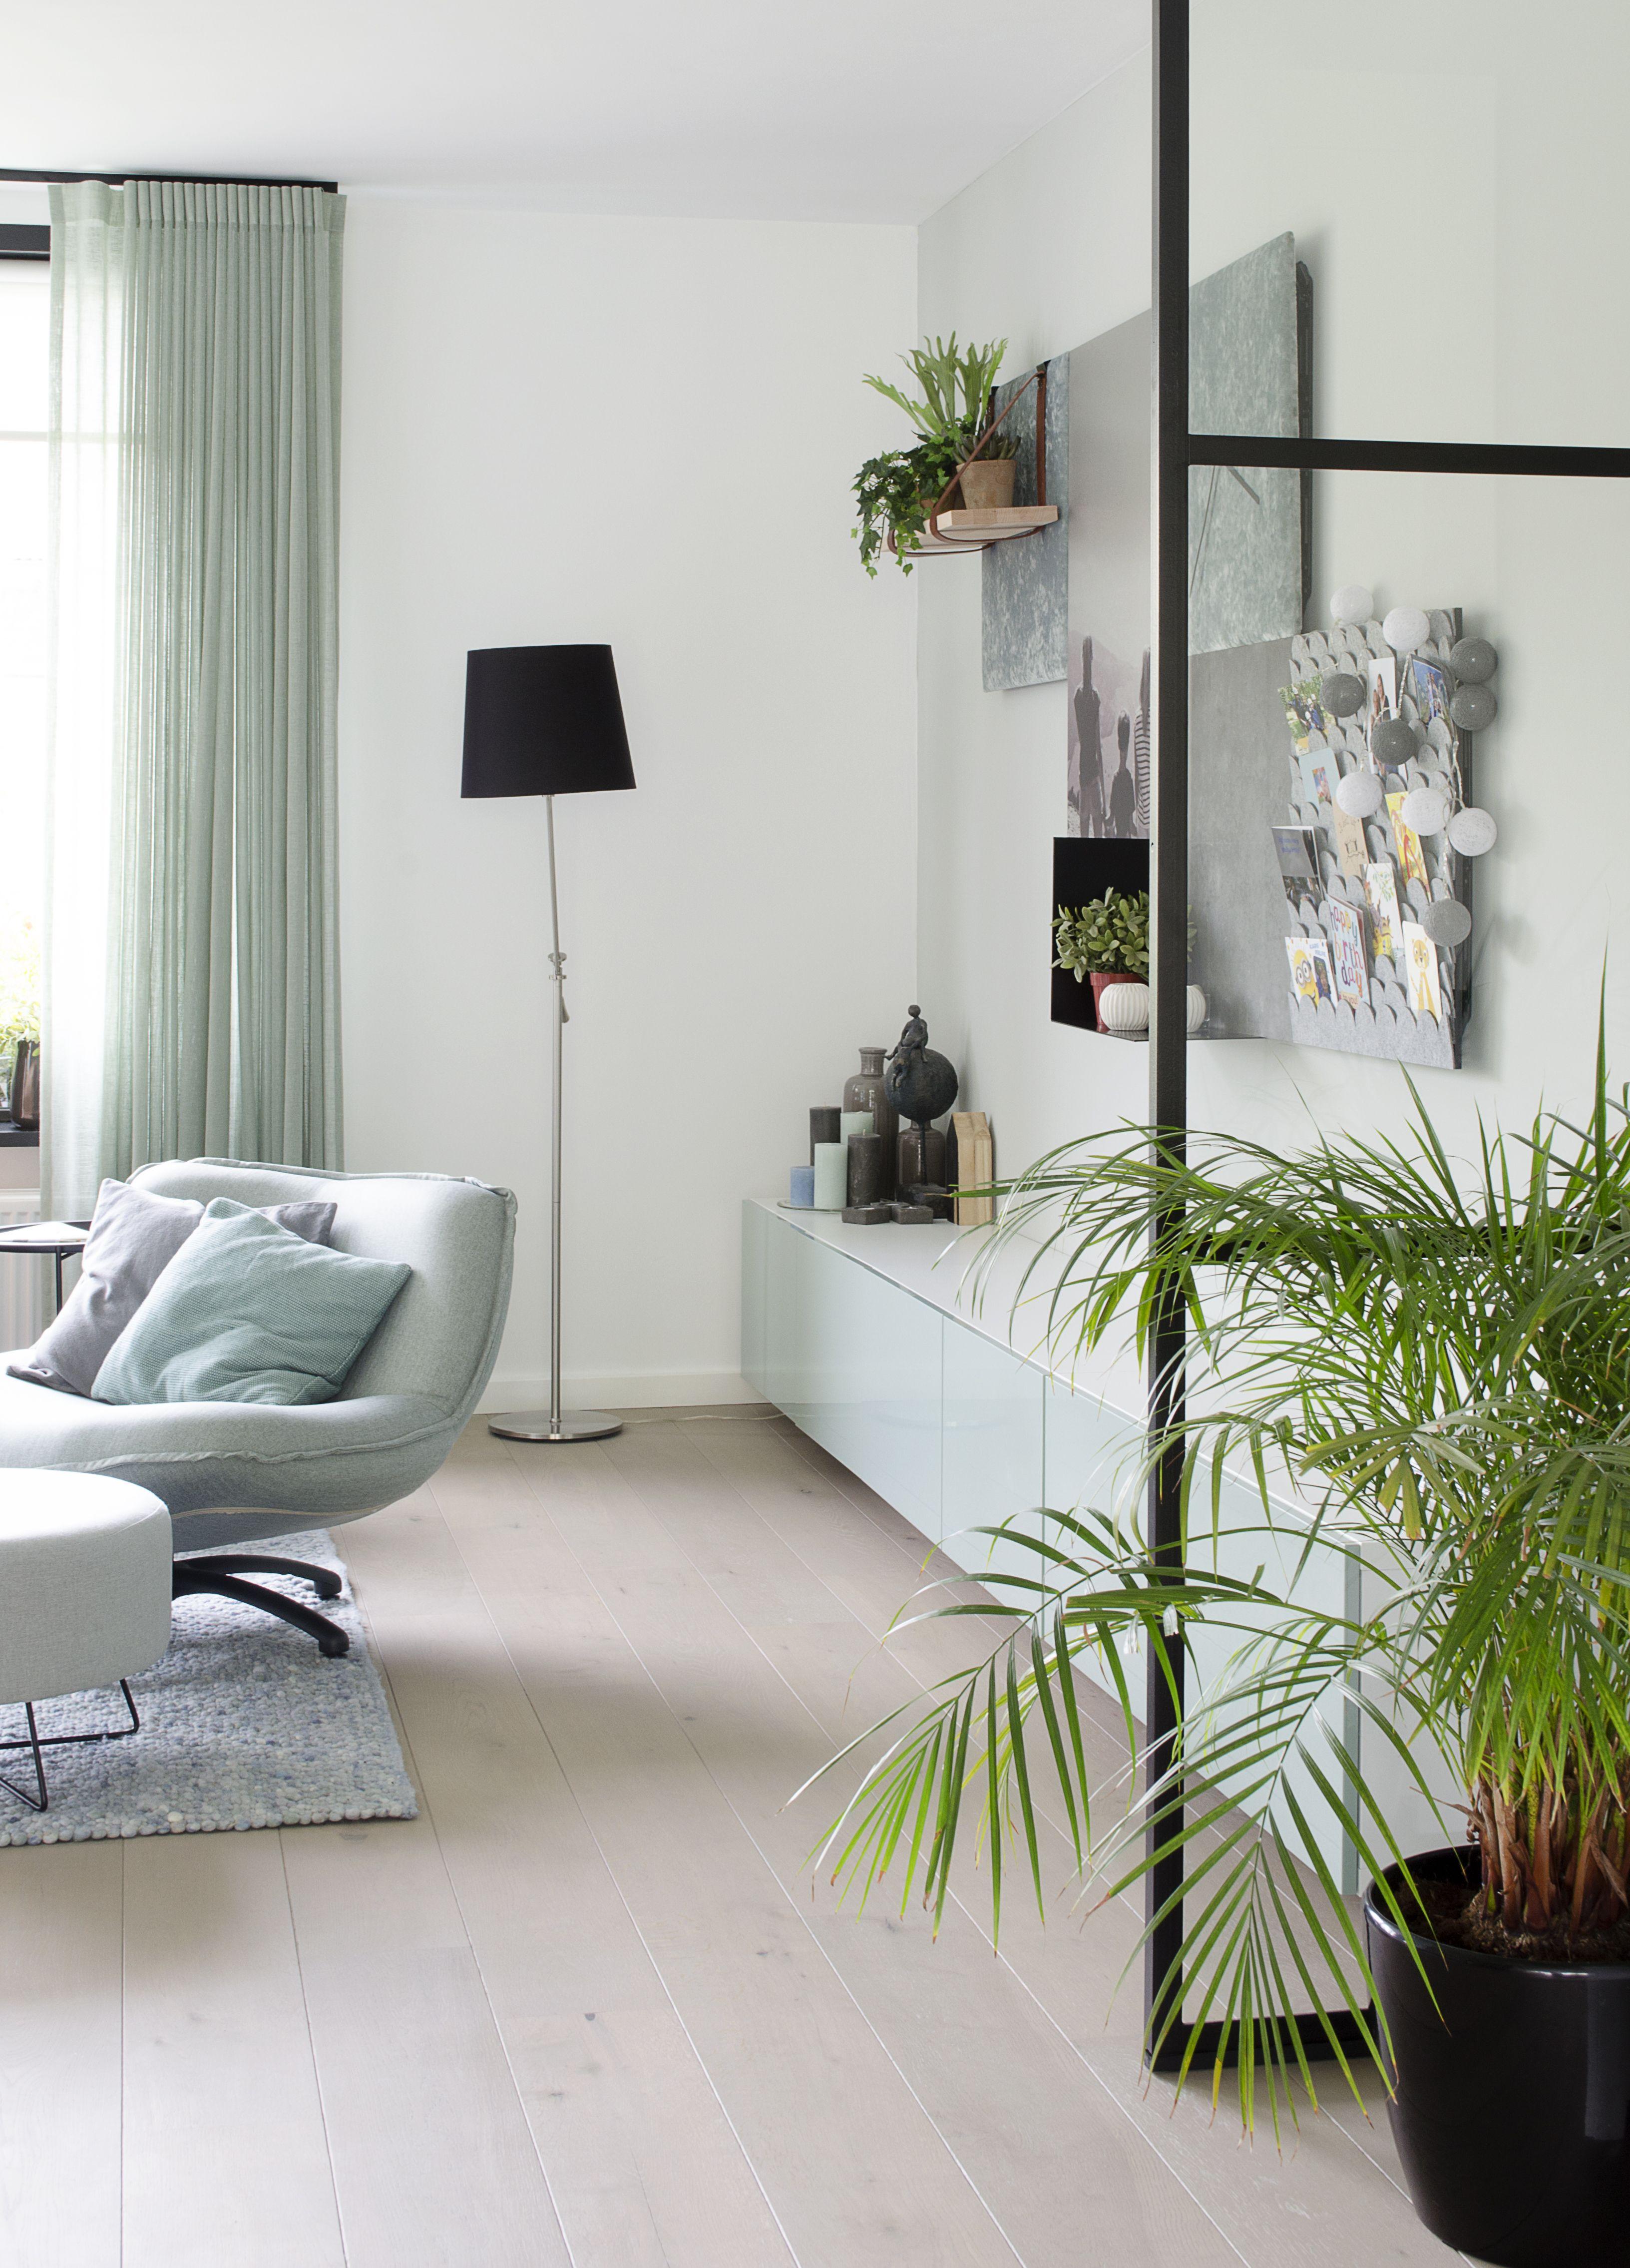 home made by_stijl binnenkijker stylist ingrid woonkamer inspiratie sfeervol interieur trends